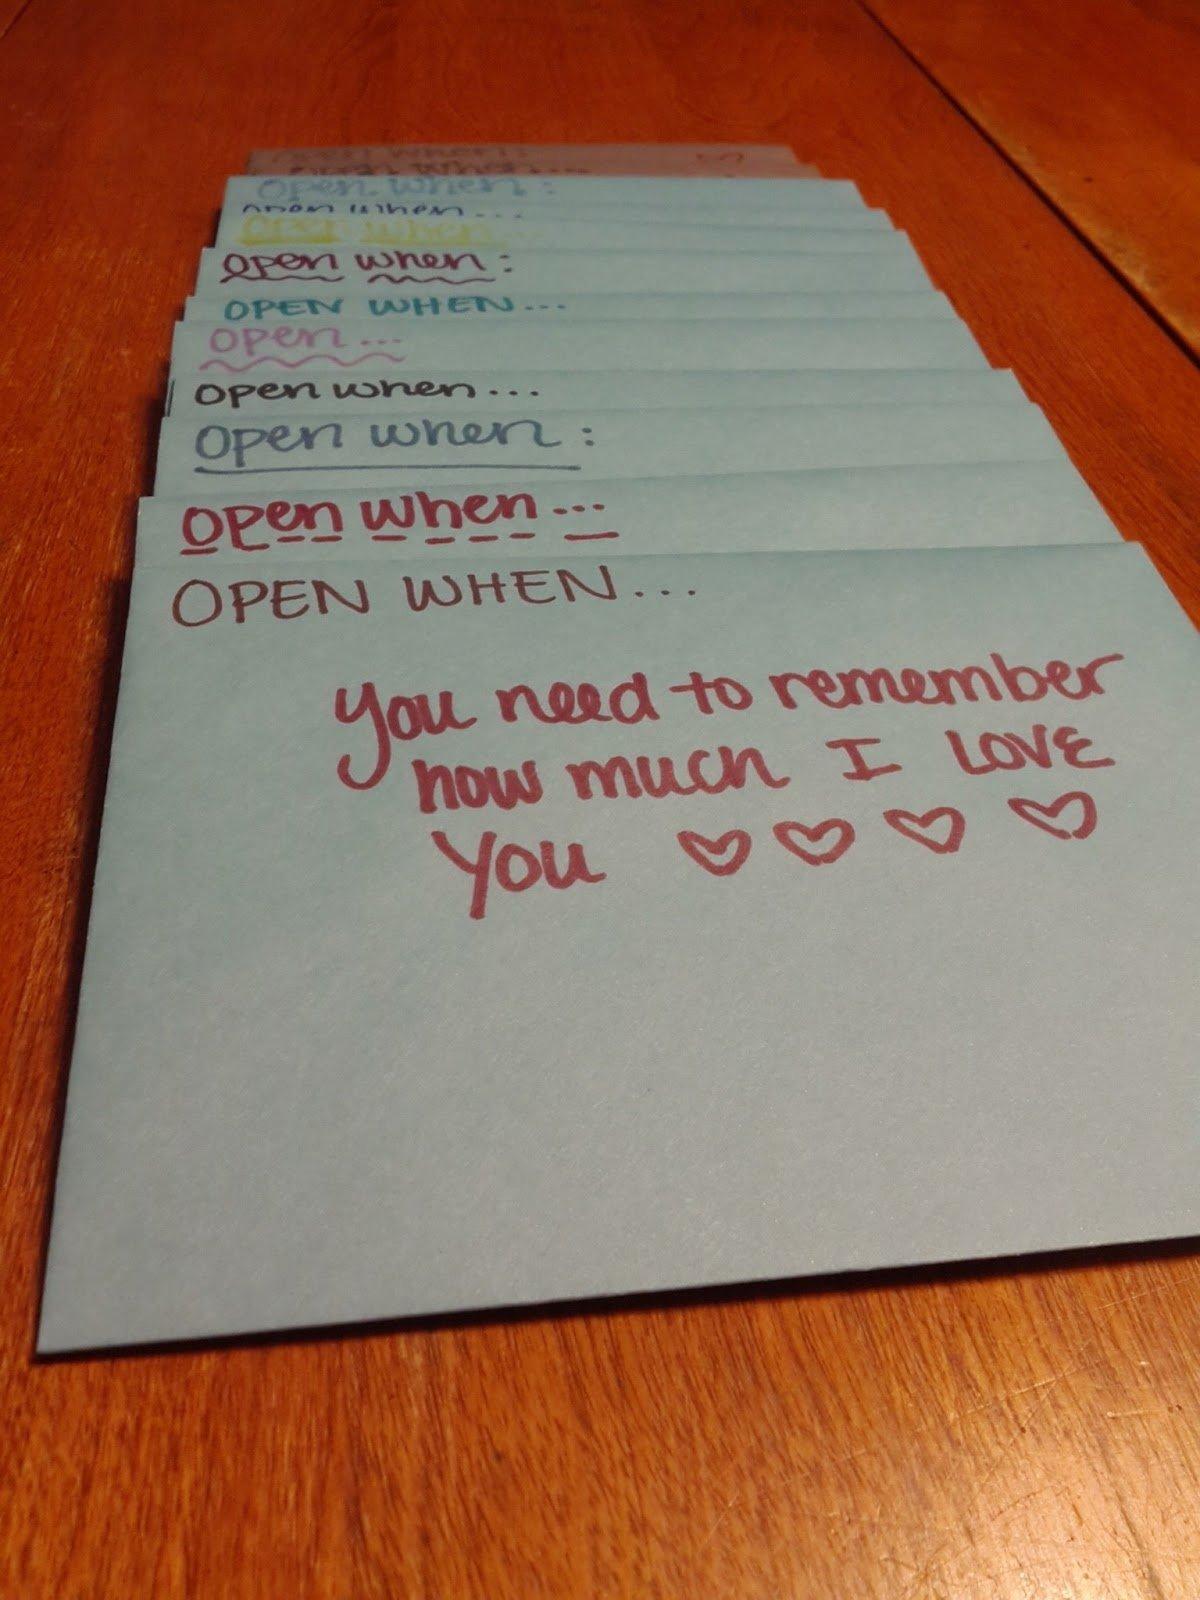 10 Elegant One Year Anniversary Ideas For Girlfriend life love lauren the paper gift 2 2020